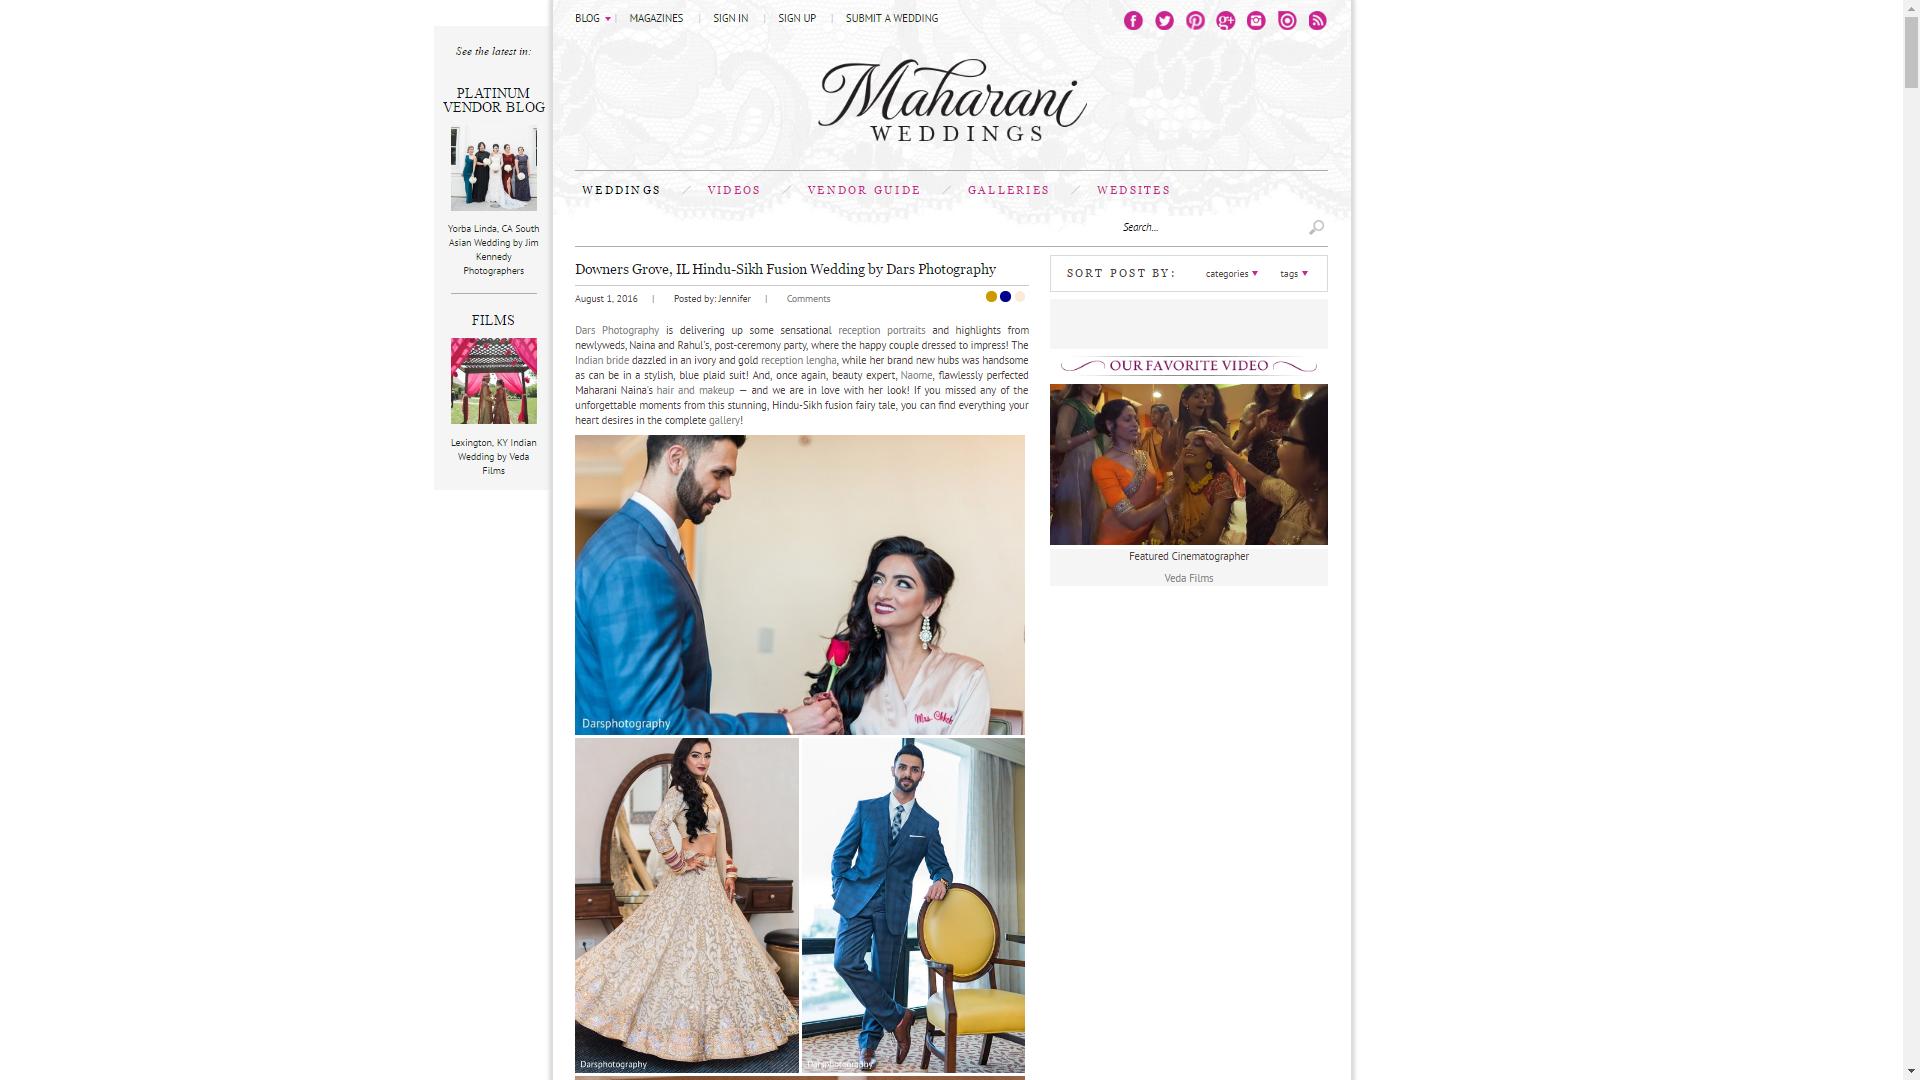 Maharani Weddings DARS Photo